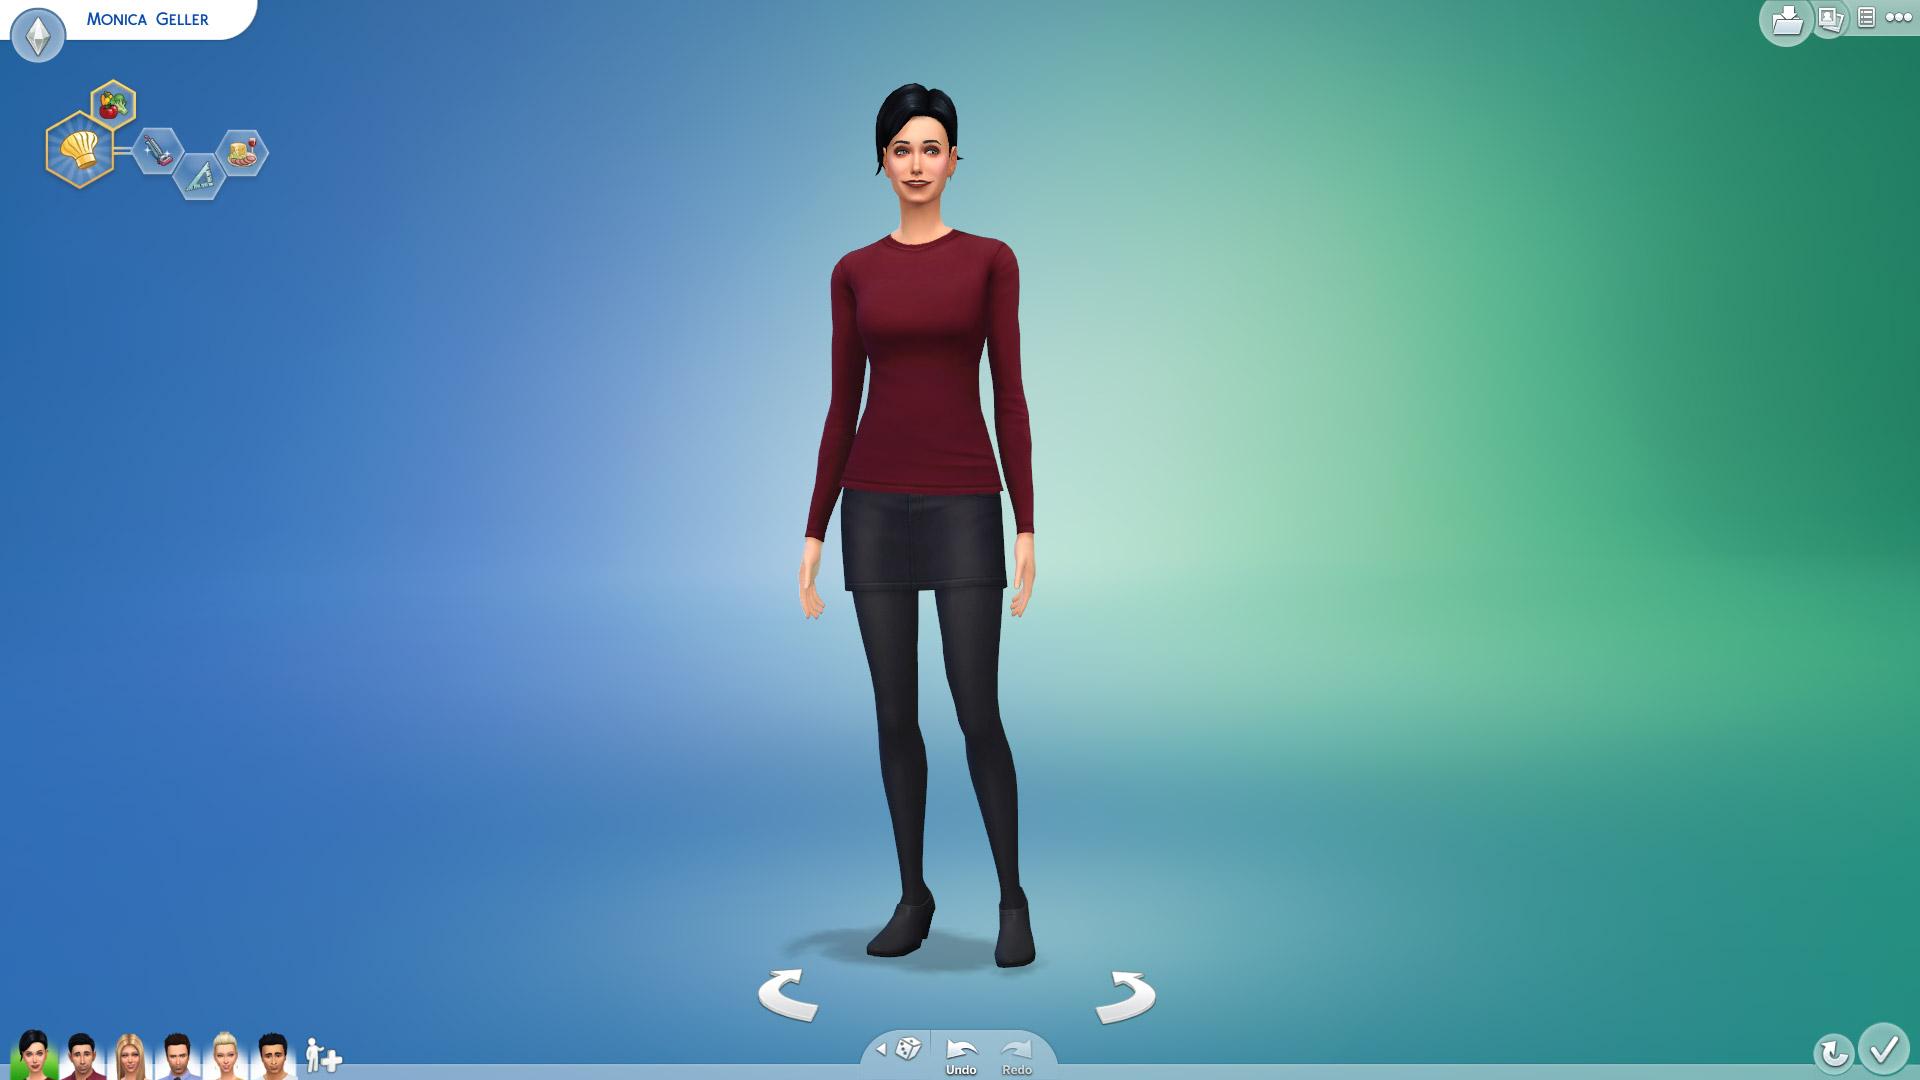 Monica Gellar In Sims